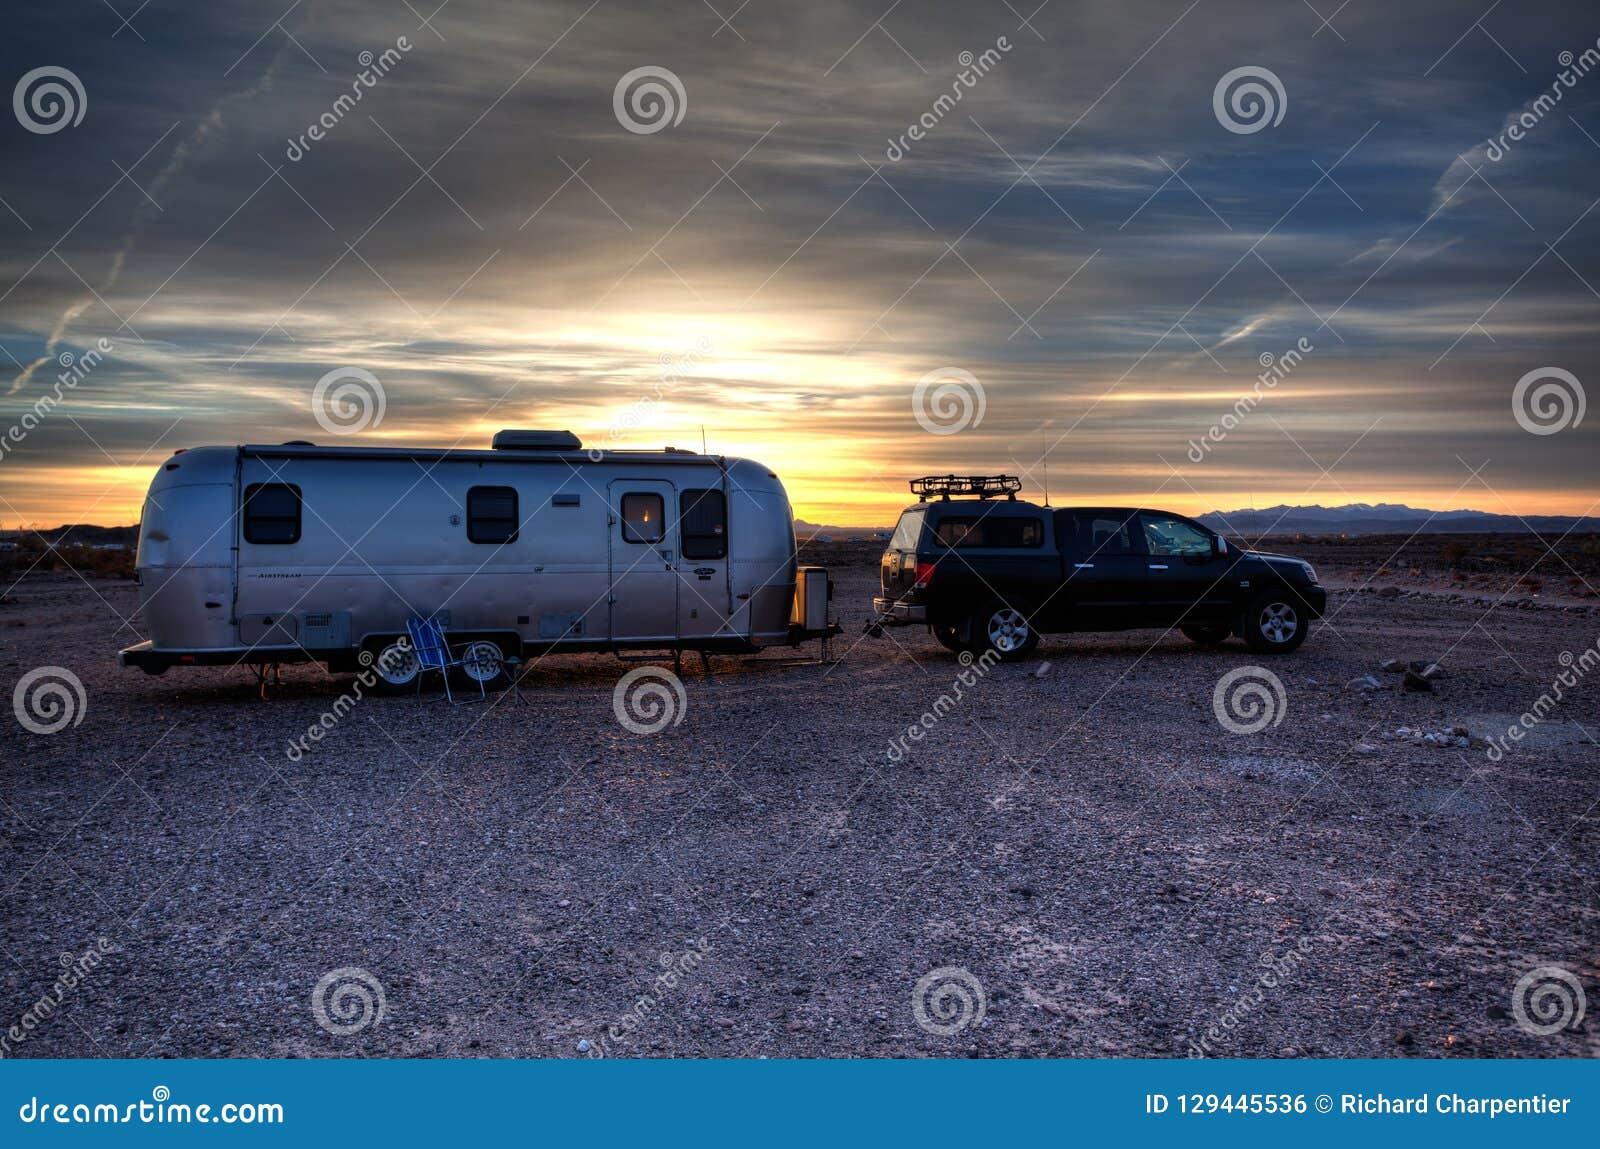 Airstream Retro Travel Trailer parked in the California Desert camping